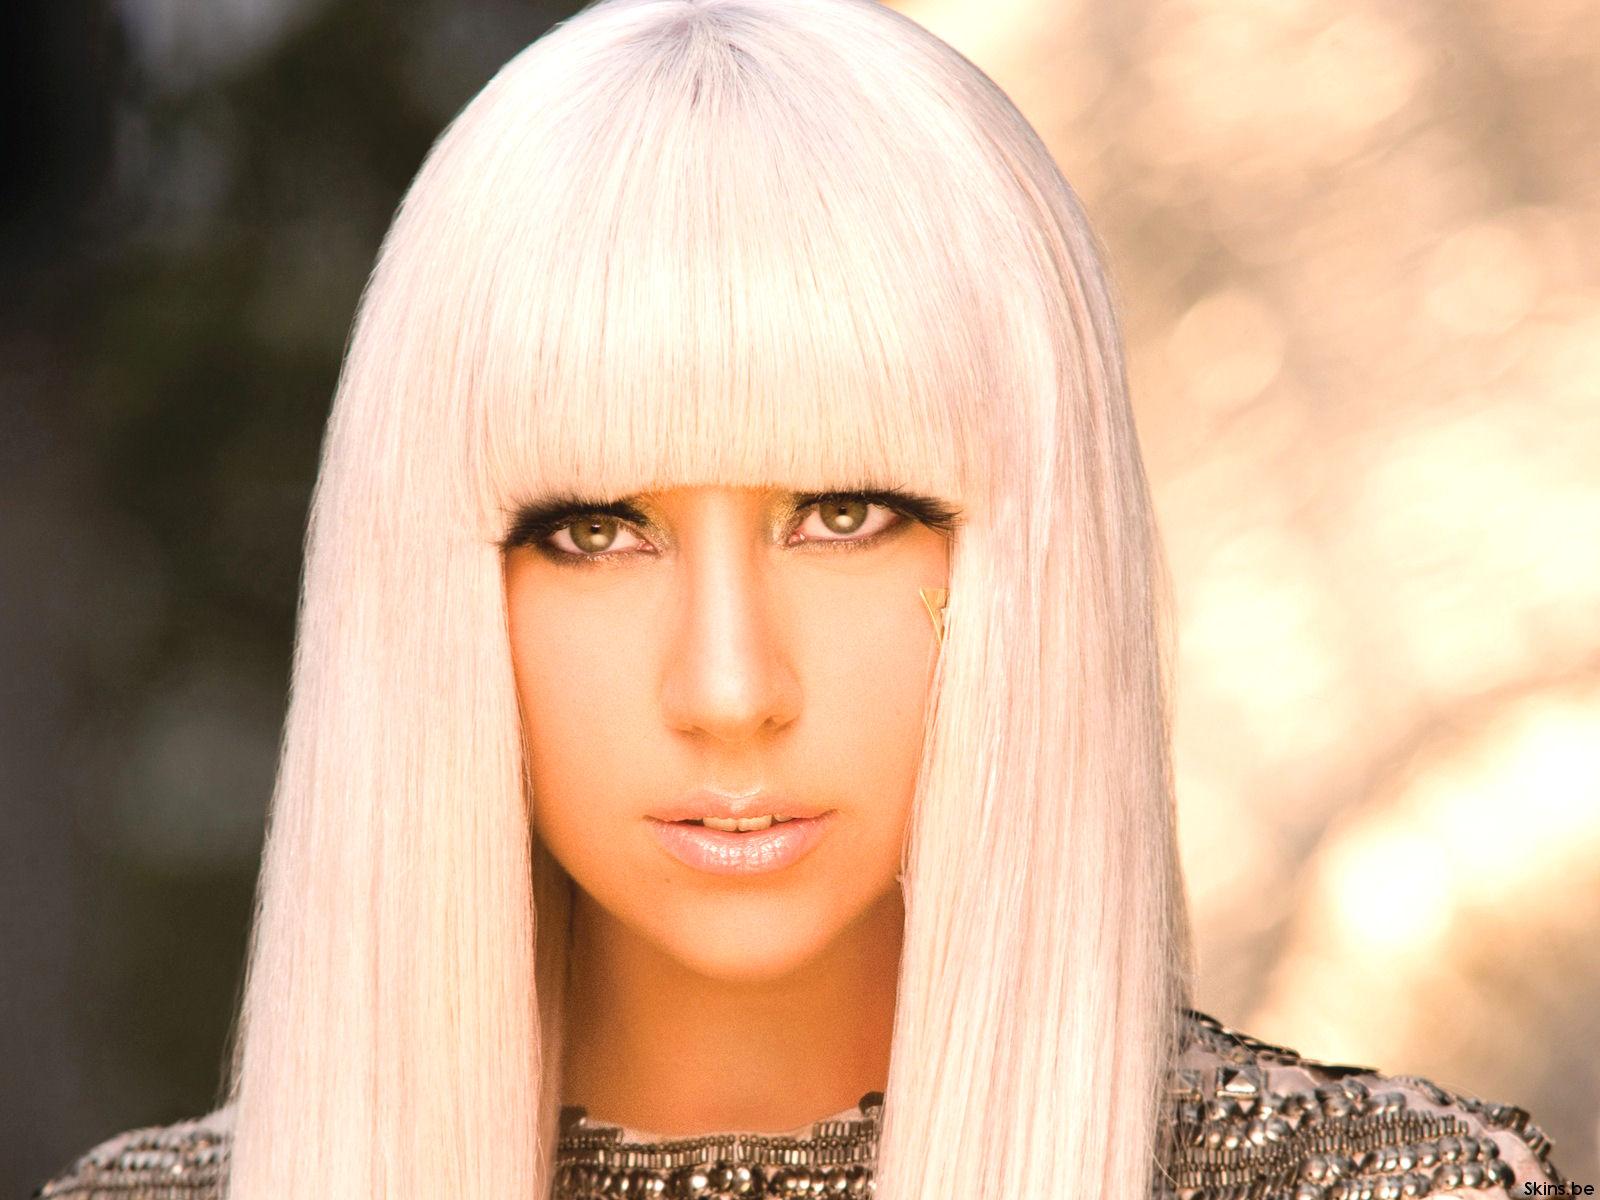 http://3.bp.blogspot.com/-tsPCVeCAAVE/T1jezgruyYI/AAAAAAAAB6c/Z58-yNb1fmM/s1600/Lady-Gaga-Piccol%2B%25285%2529.jpg